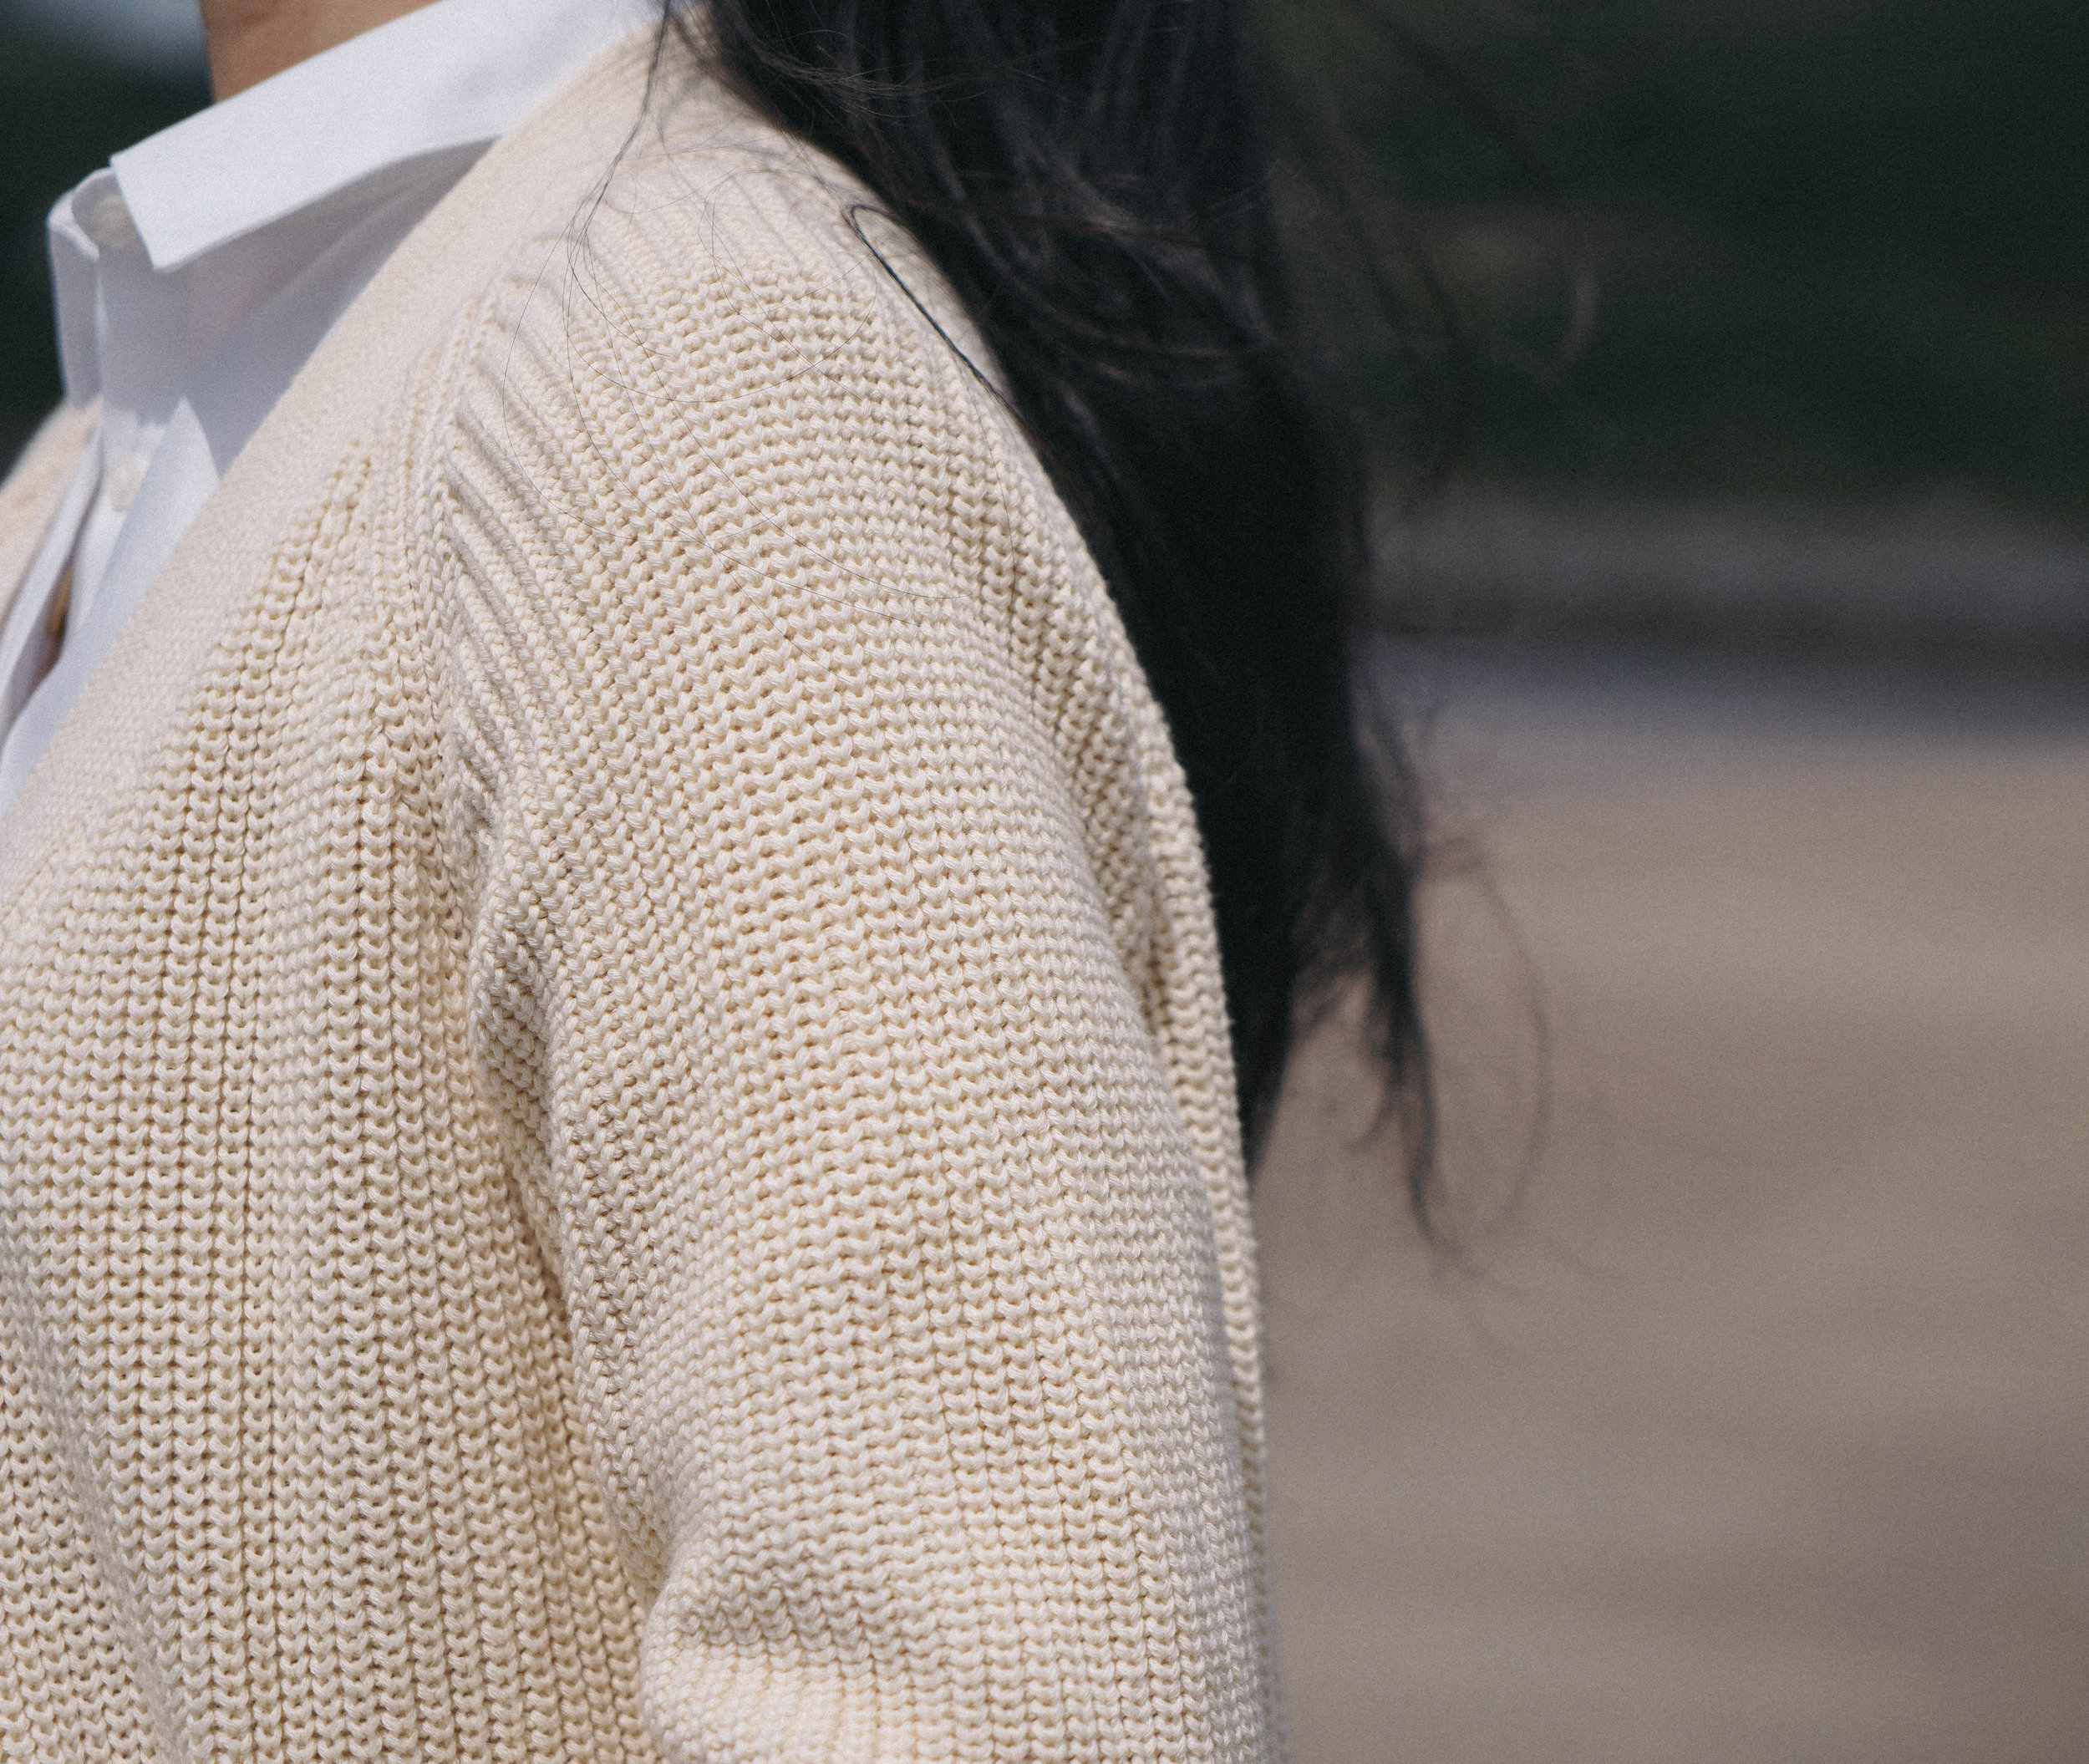 dingle ireland-l'envers sweater-slow fashion.jpg